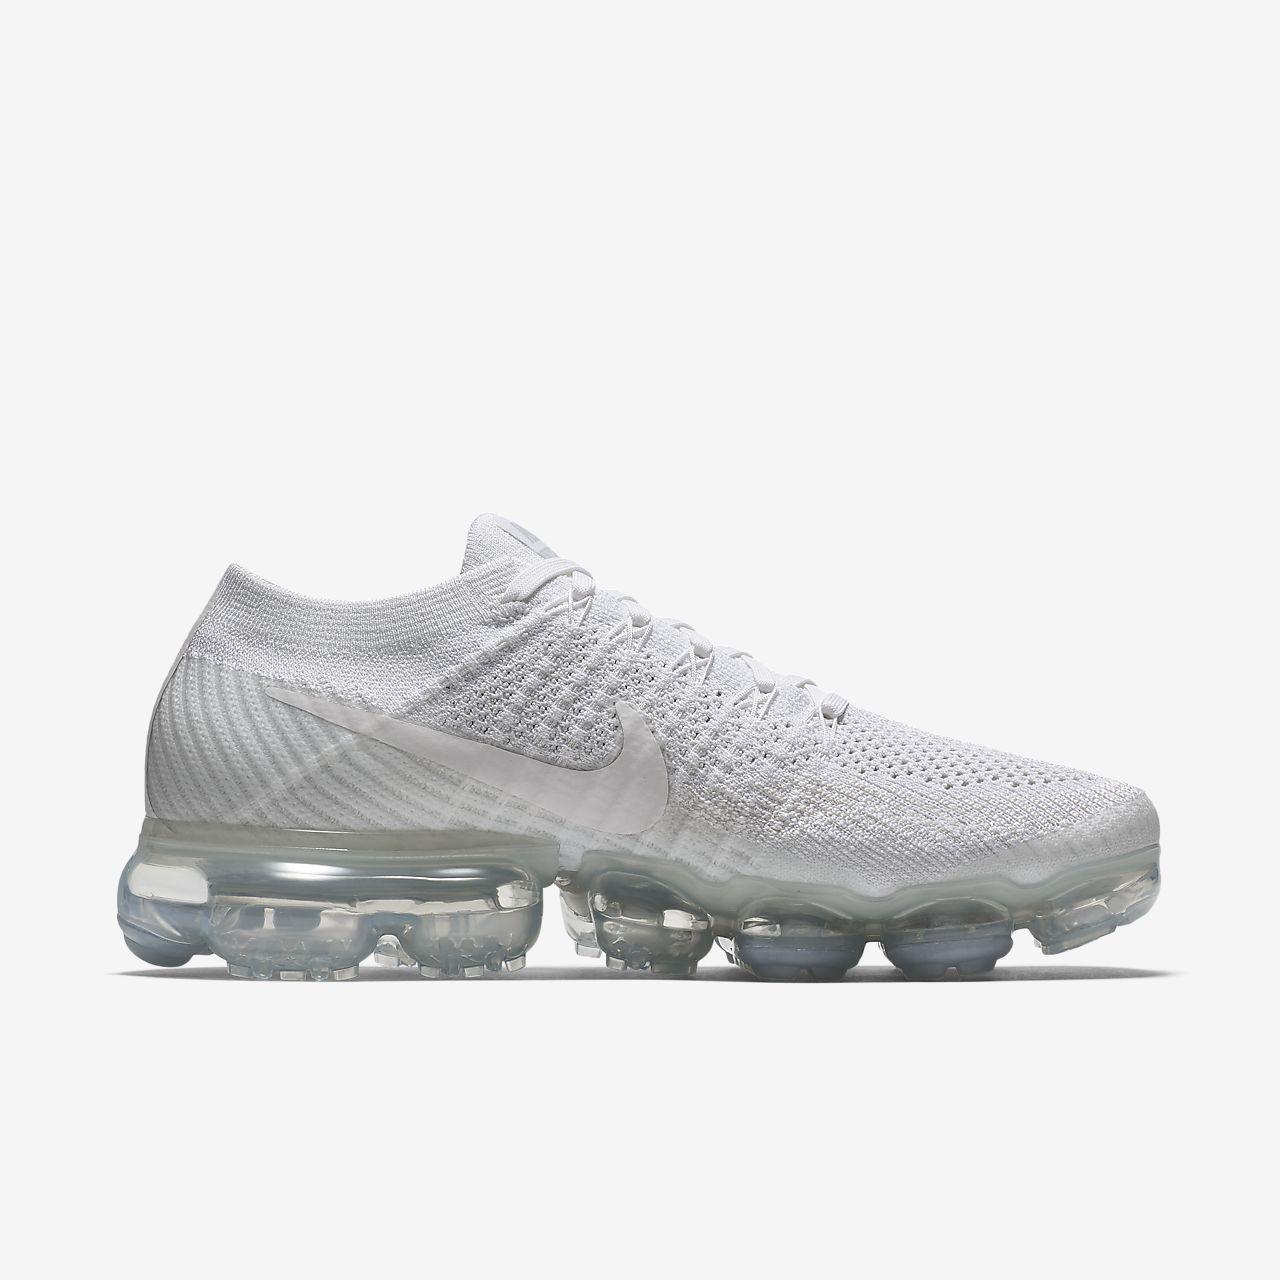 Nike Vapormax Aire Flyknit Para Mujer Zapato Corriente Icono Blanco 2015 en línea mLpAPodA2H